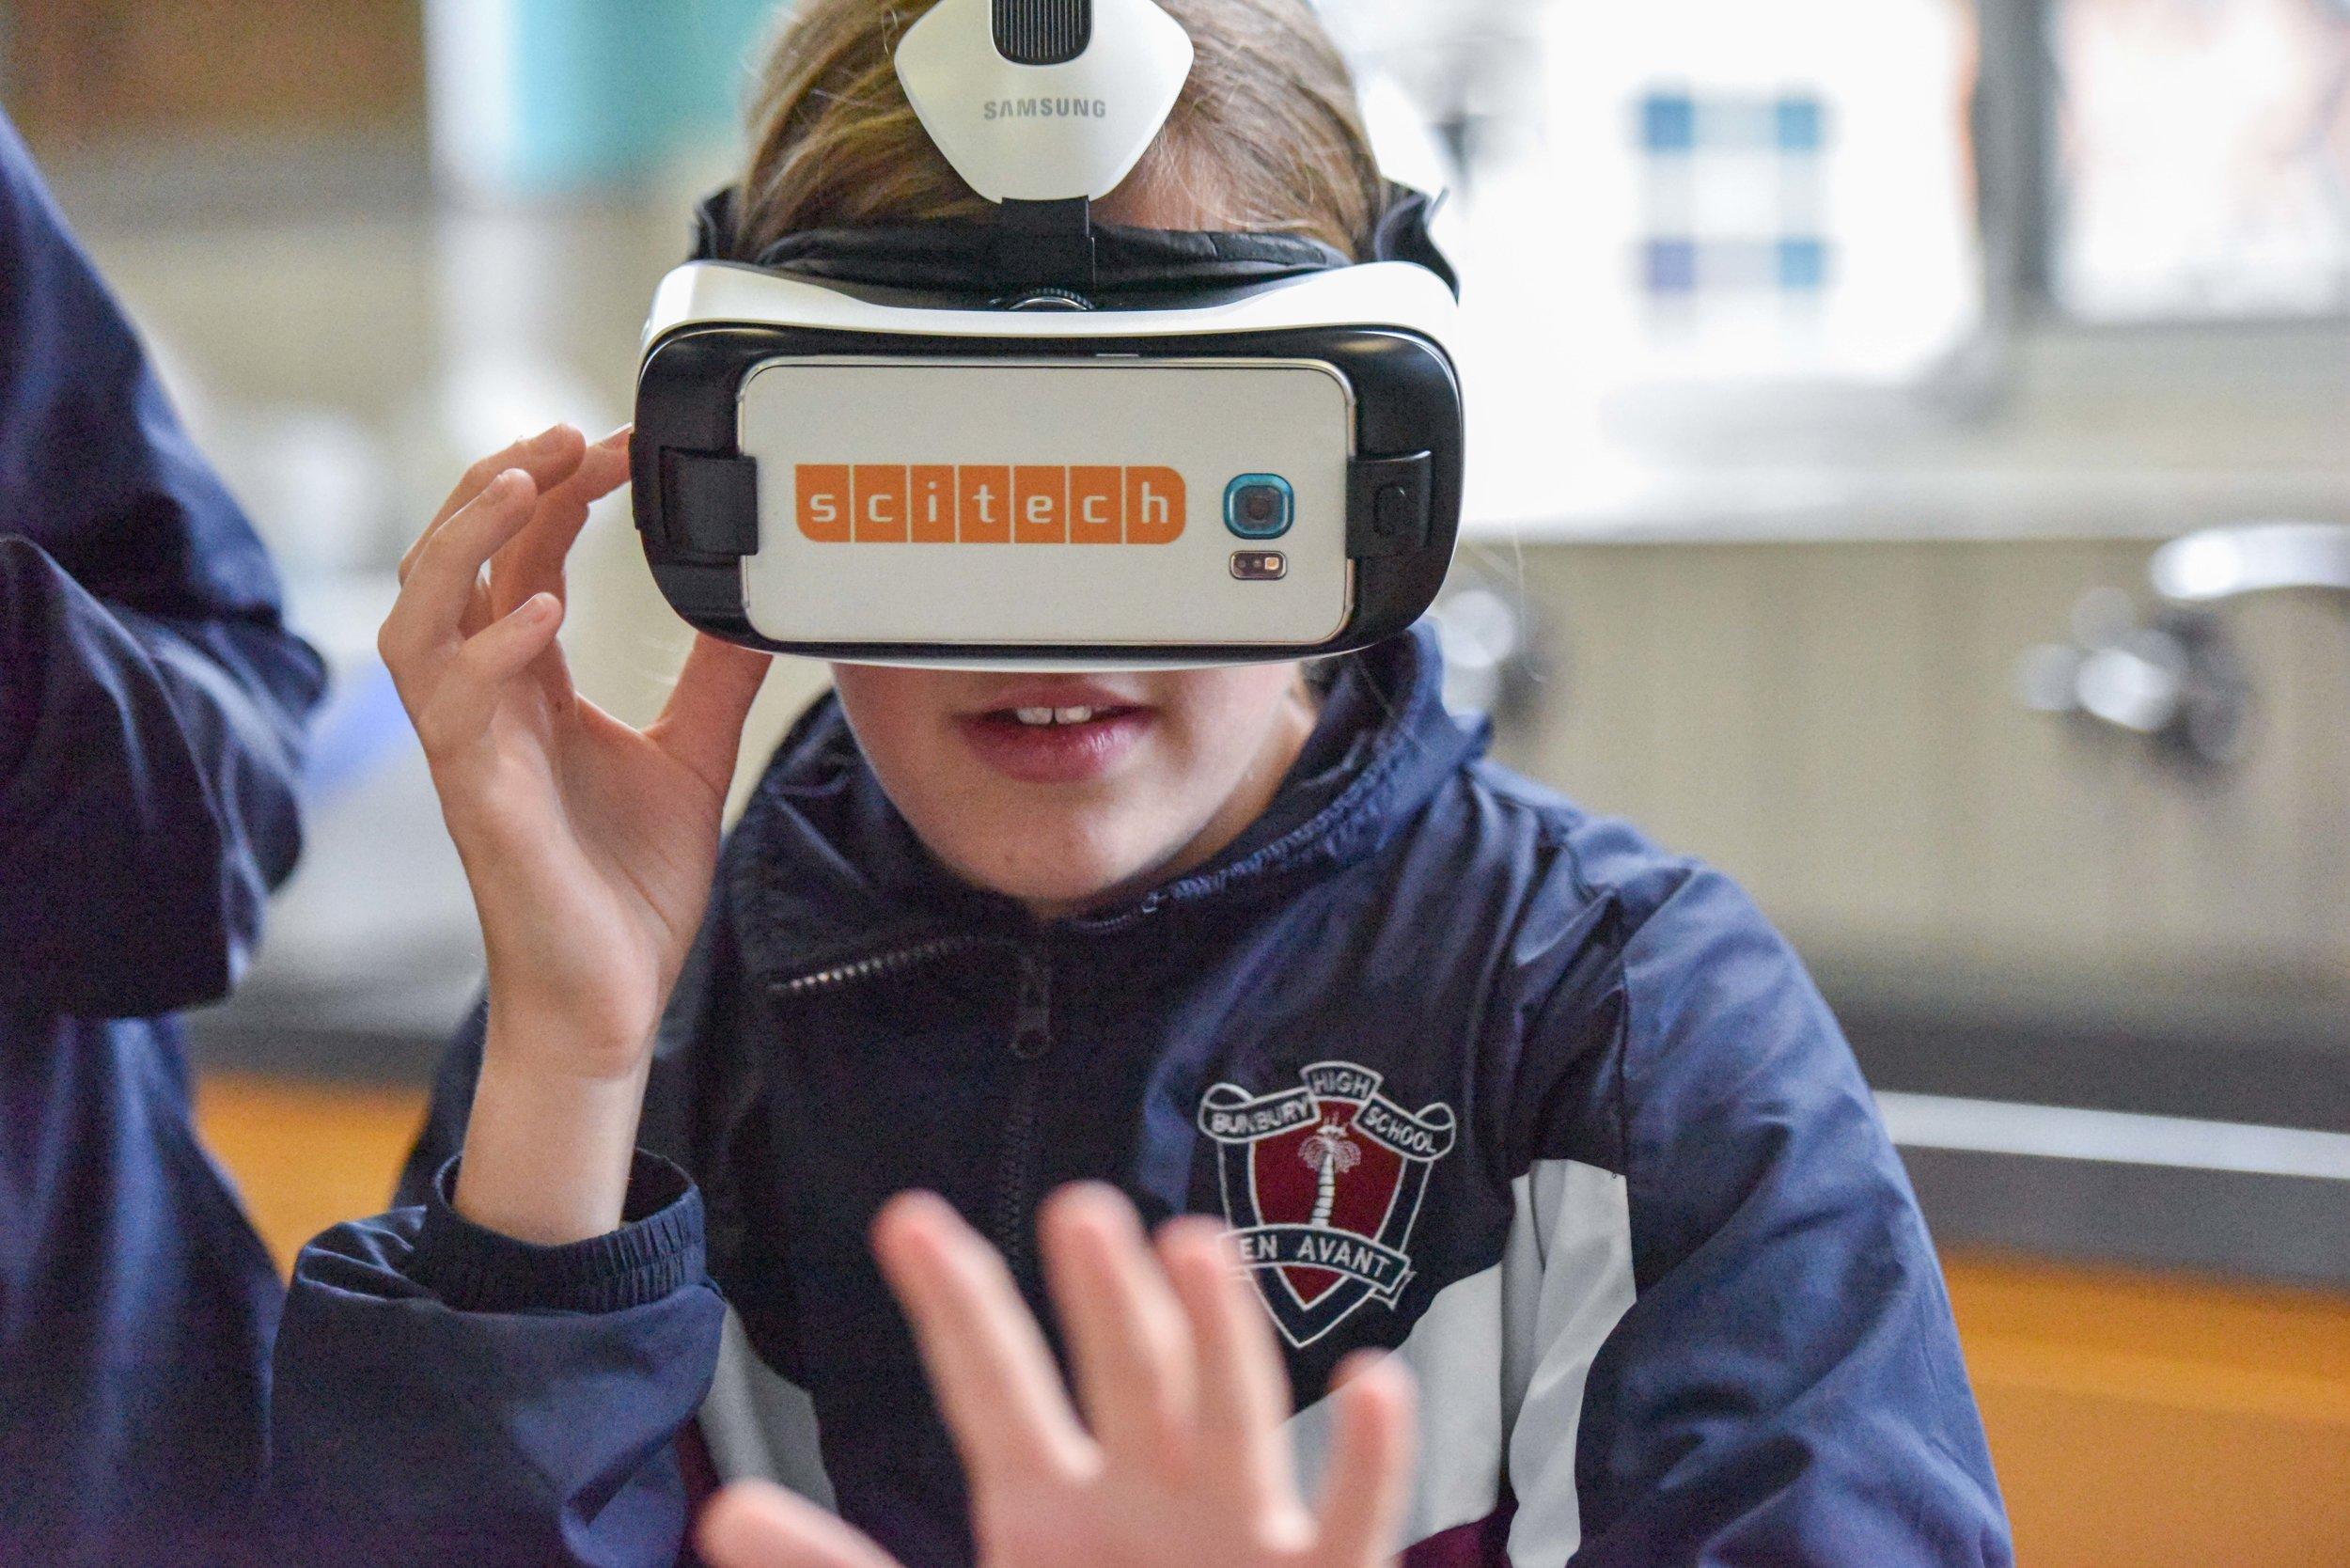 Students at Bunbury Senior High School experience virtual reality headsets, courtesy of Scitech. Photo copyright: Kate Ferguson/WIWTA